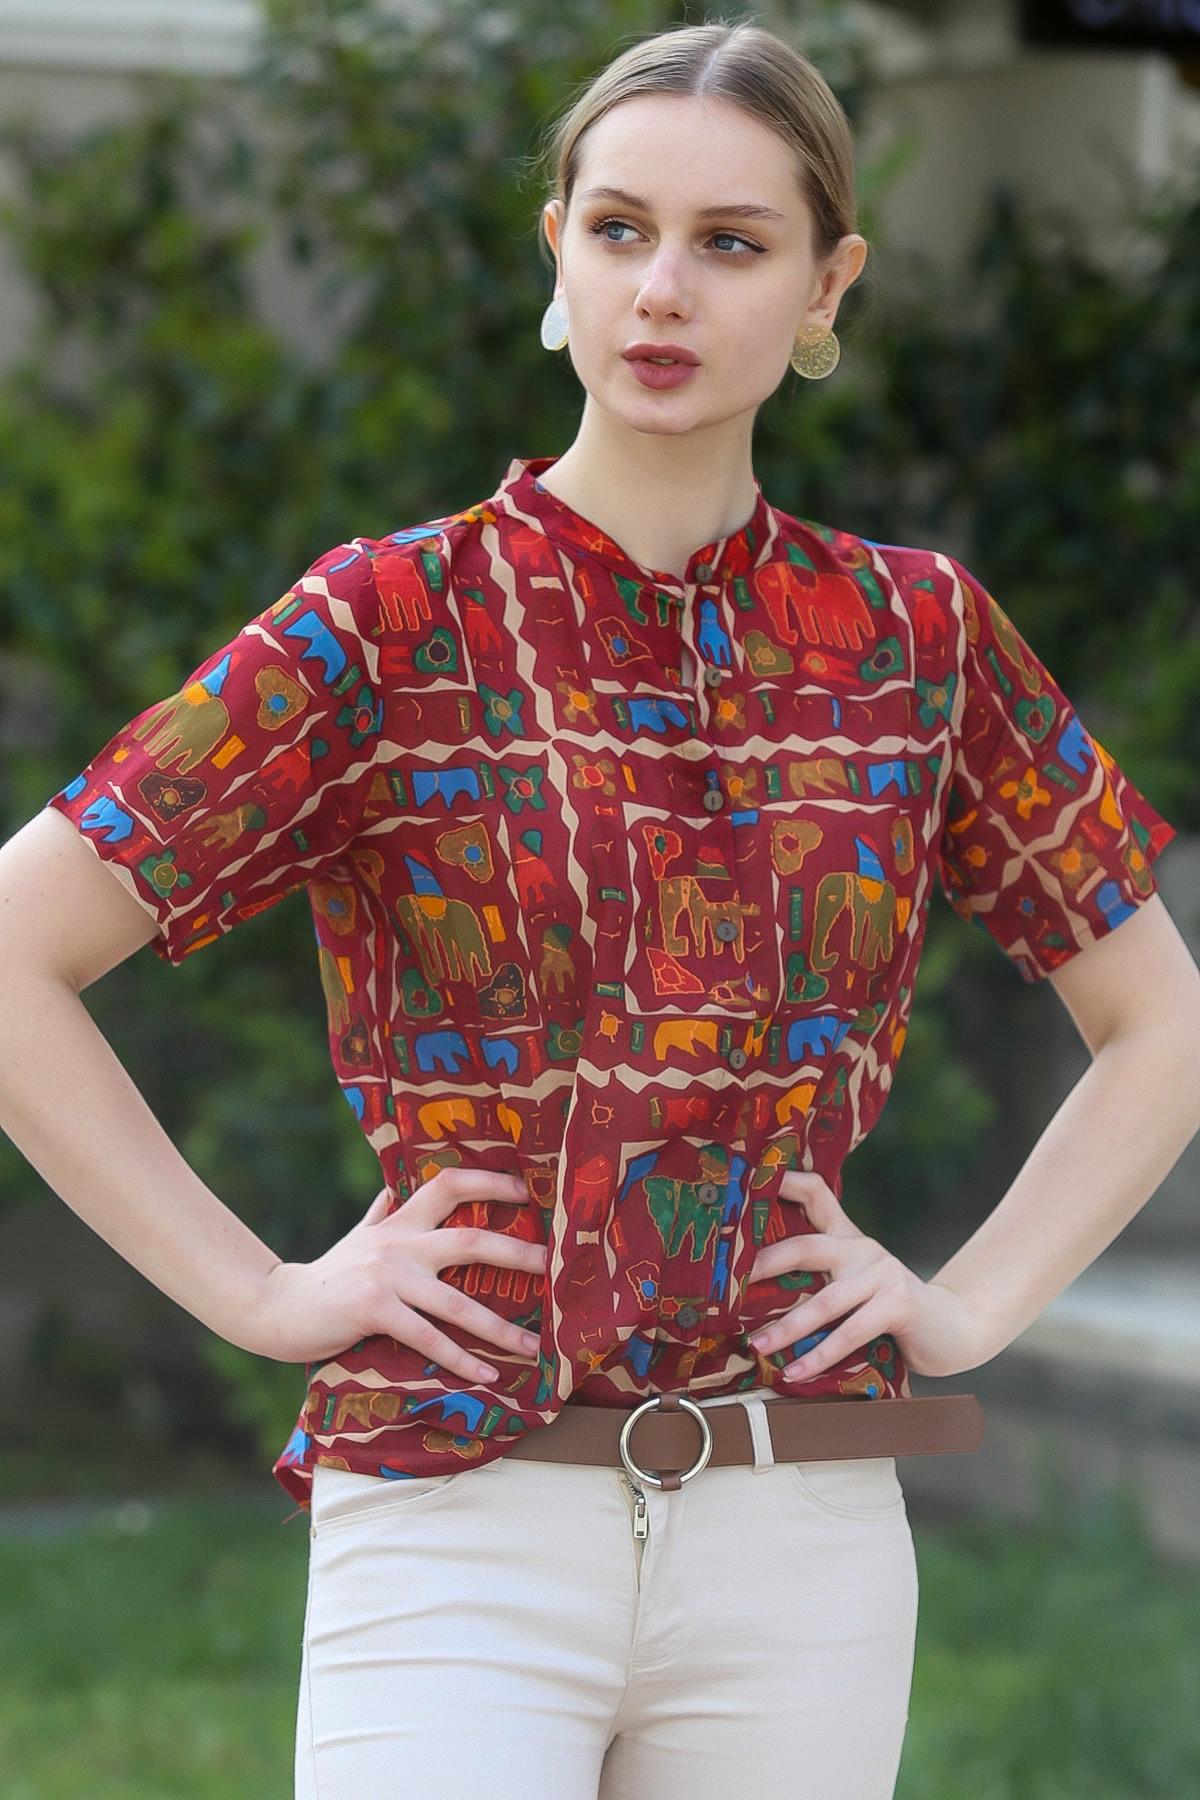 Chiccy Kadın Bordo Yakasız Düğme Detaylı Fil Desenli Dokuma Bluz M10010200BL95376